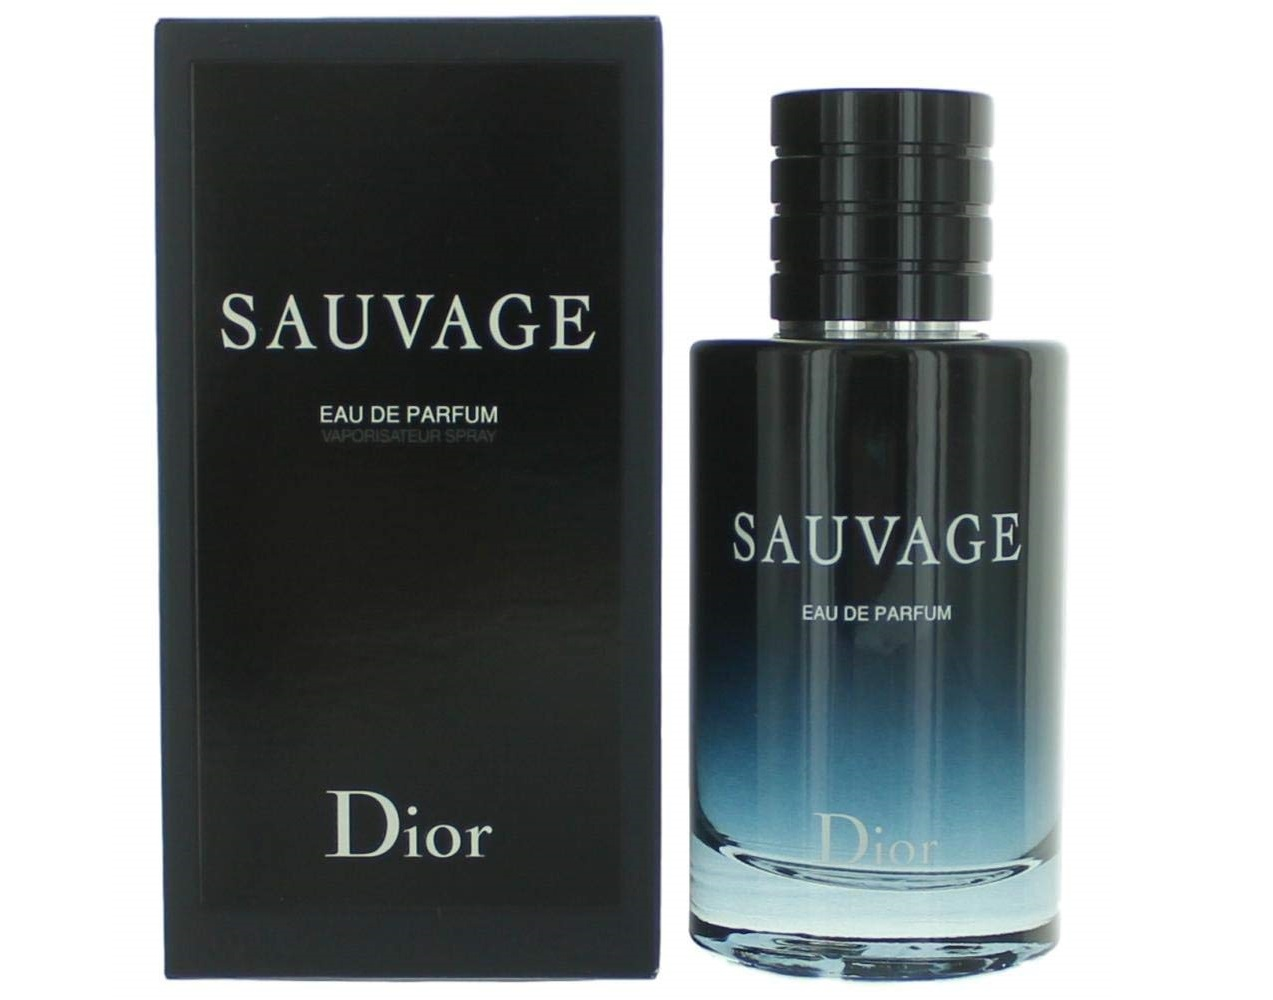 dior sauvage 100ml eau de parfum perfume malaysia best price. Black Bedroom Furniture Sets. Home Design Ideas